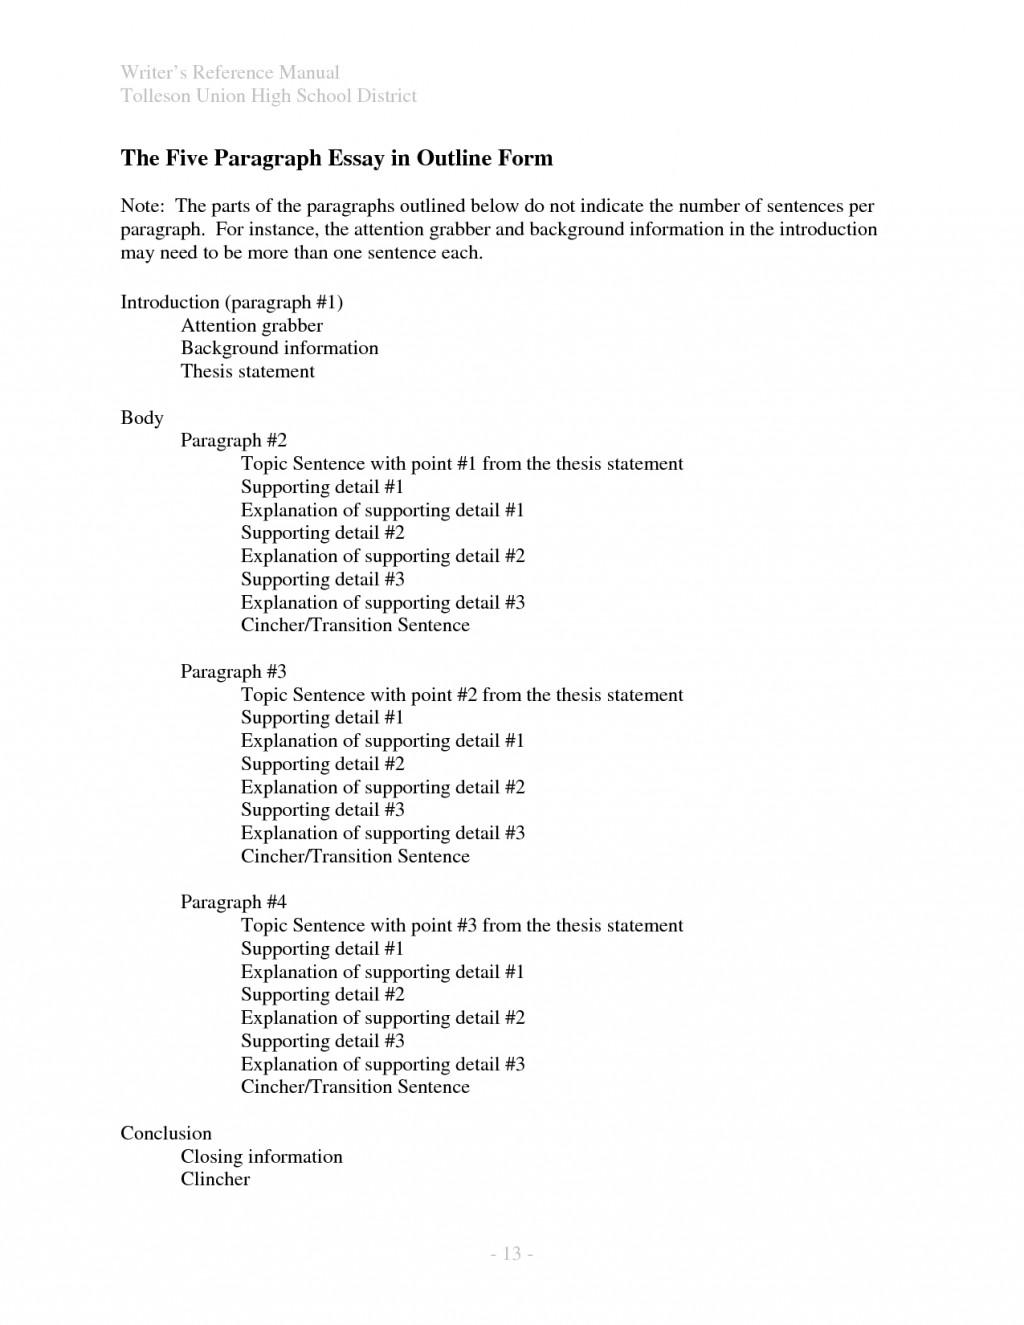 005 Argumentative Essay College Outline Pdf Printables Corner Seaapi Com Wp Content Uploads Argumentativ Caus Stupendous Sample Template Persuasive Topics Middle School Large